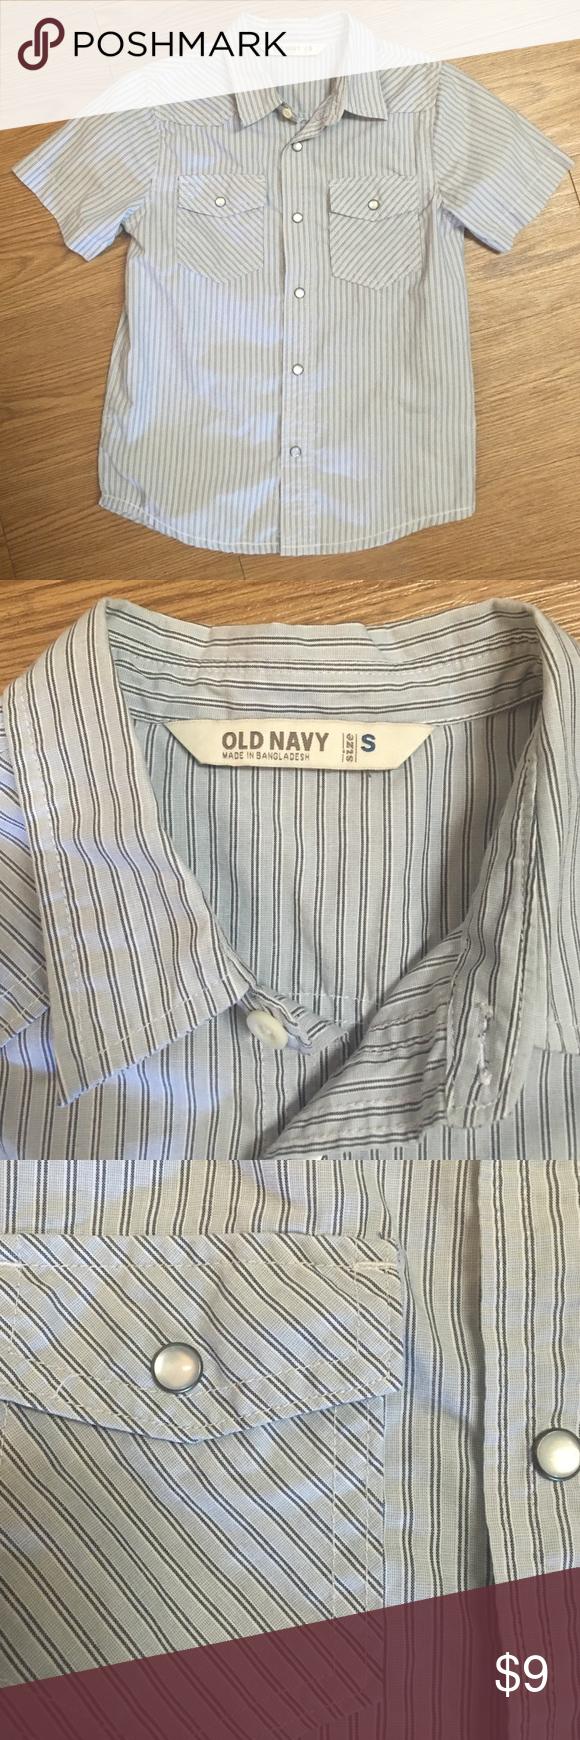 Boy's Old Navy pearl snap shirt size small Gray pearl snap shirt with blue pin stripes. Boy's size small. Like new. Old Navy Shirts & Tops Button Down Shirts